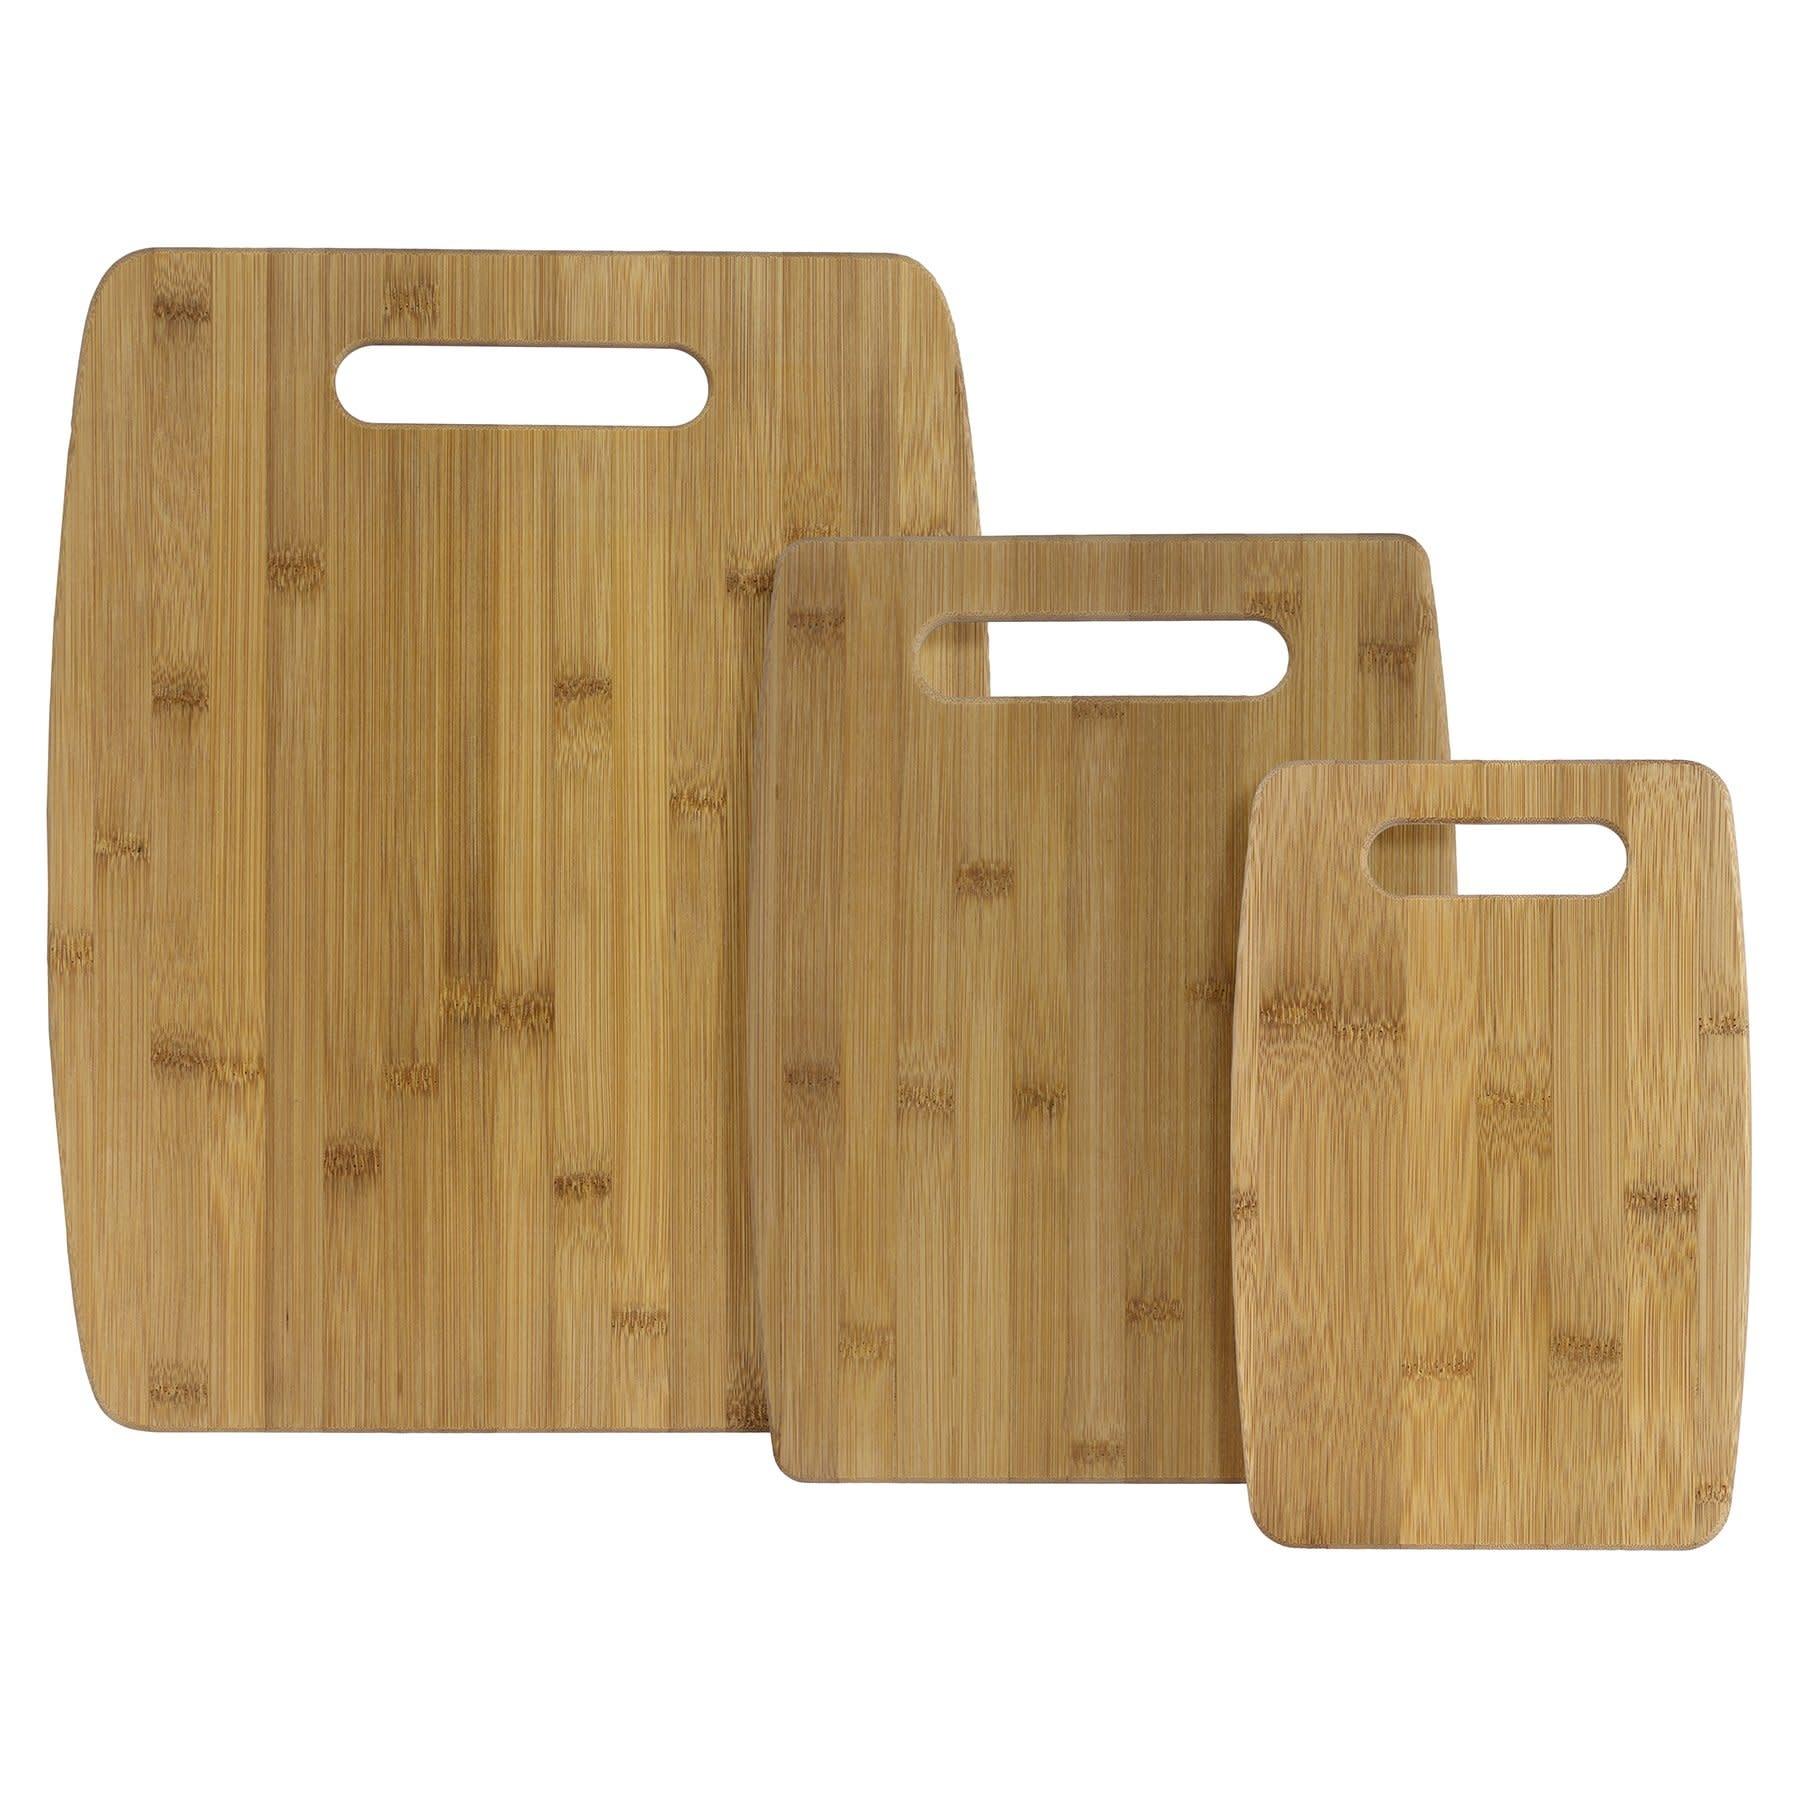 Totally Bamboo 3pc Bamboo Cutting Board Set